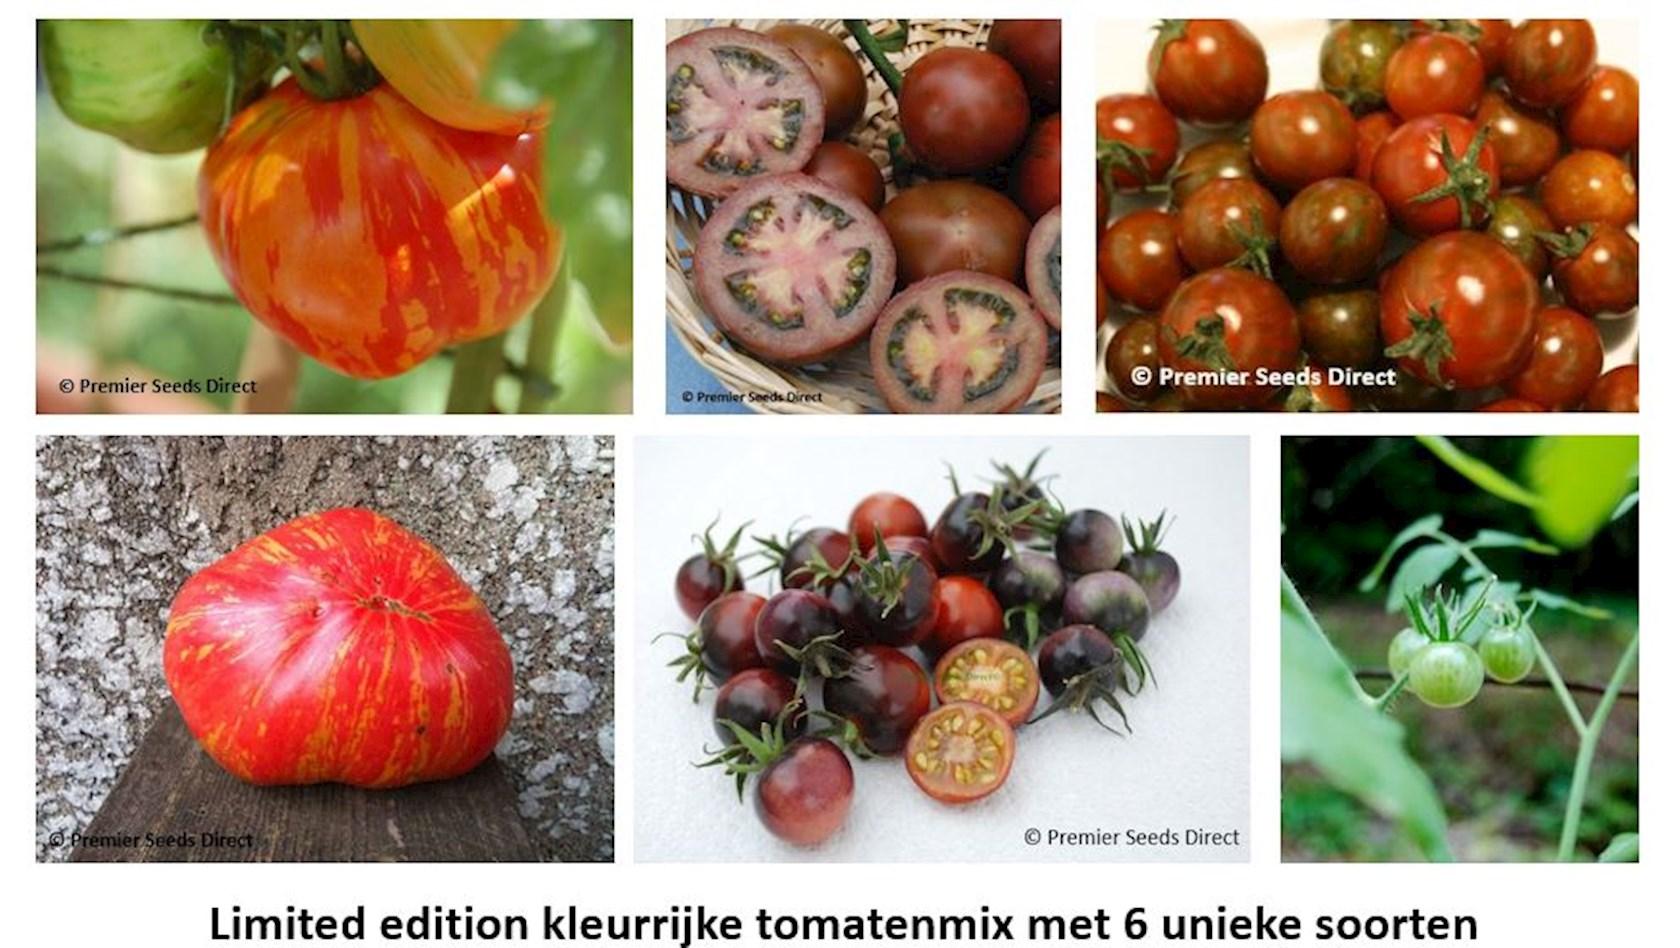 Tuindagen Beervelde unieke kleurrijke tomatenmix pakket (6 tomatenvariëteiten)